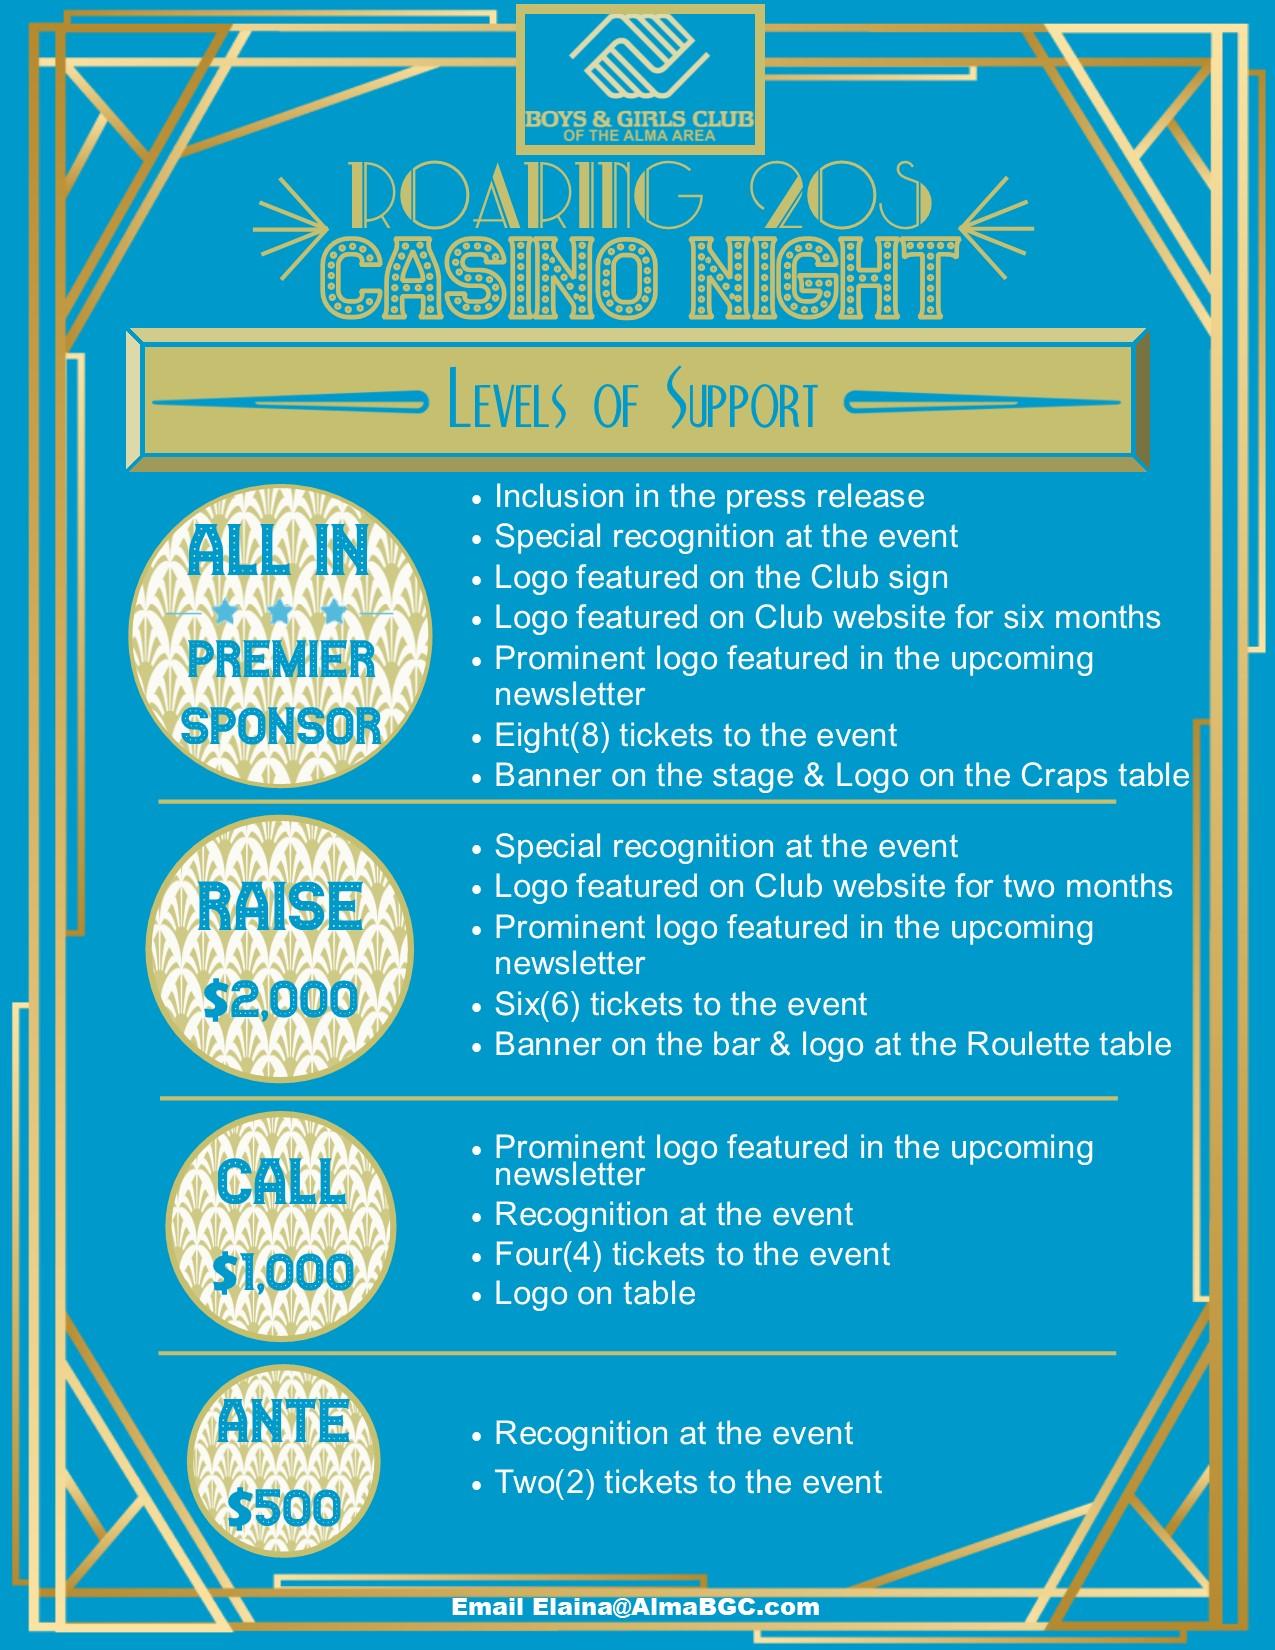 Casino Night Sponsorship.jpg